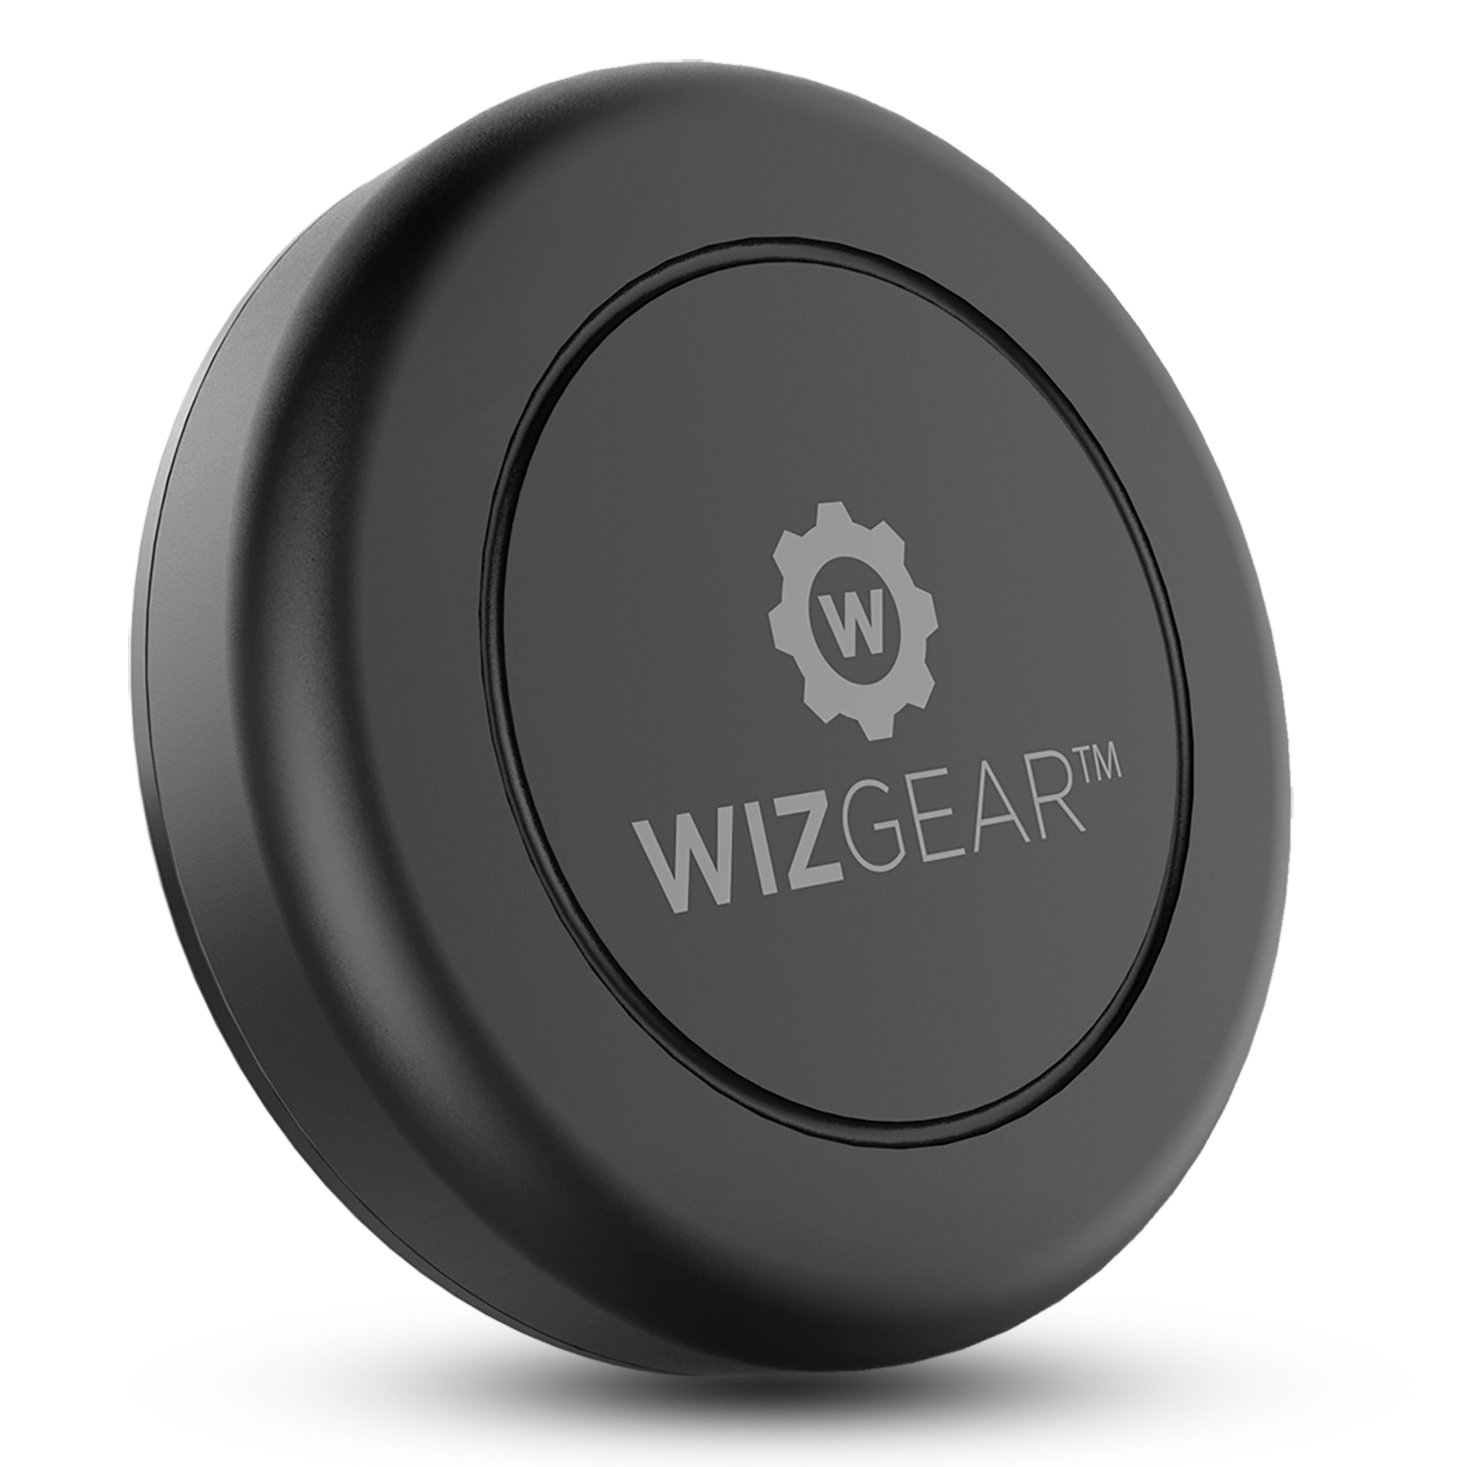 Soporte Celular para Autos Magnetico WIZGEAR - 1F7KNJDM